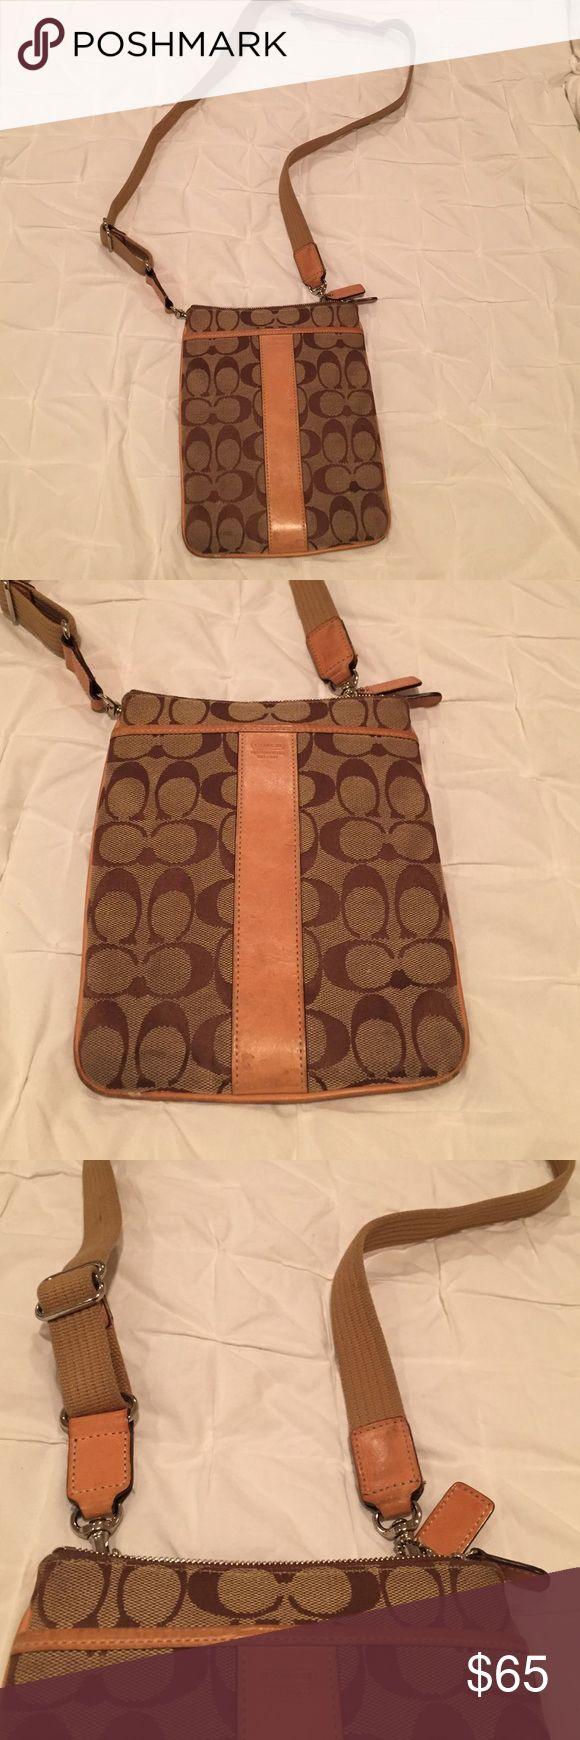 Coach Messenger Bag Coach Messenger bag. Shows signs of use. Coach Bags Crossbody Bags